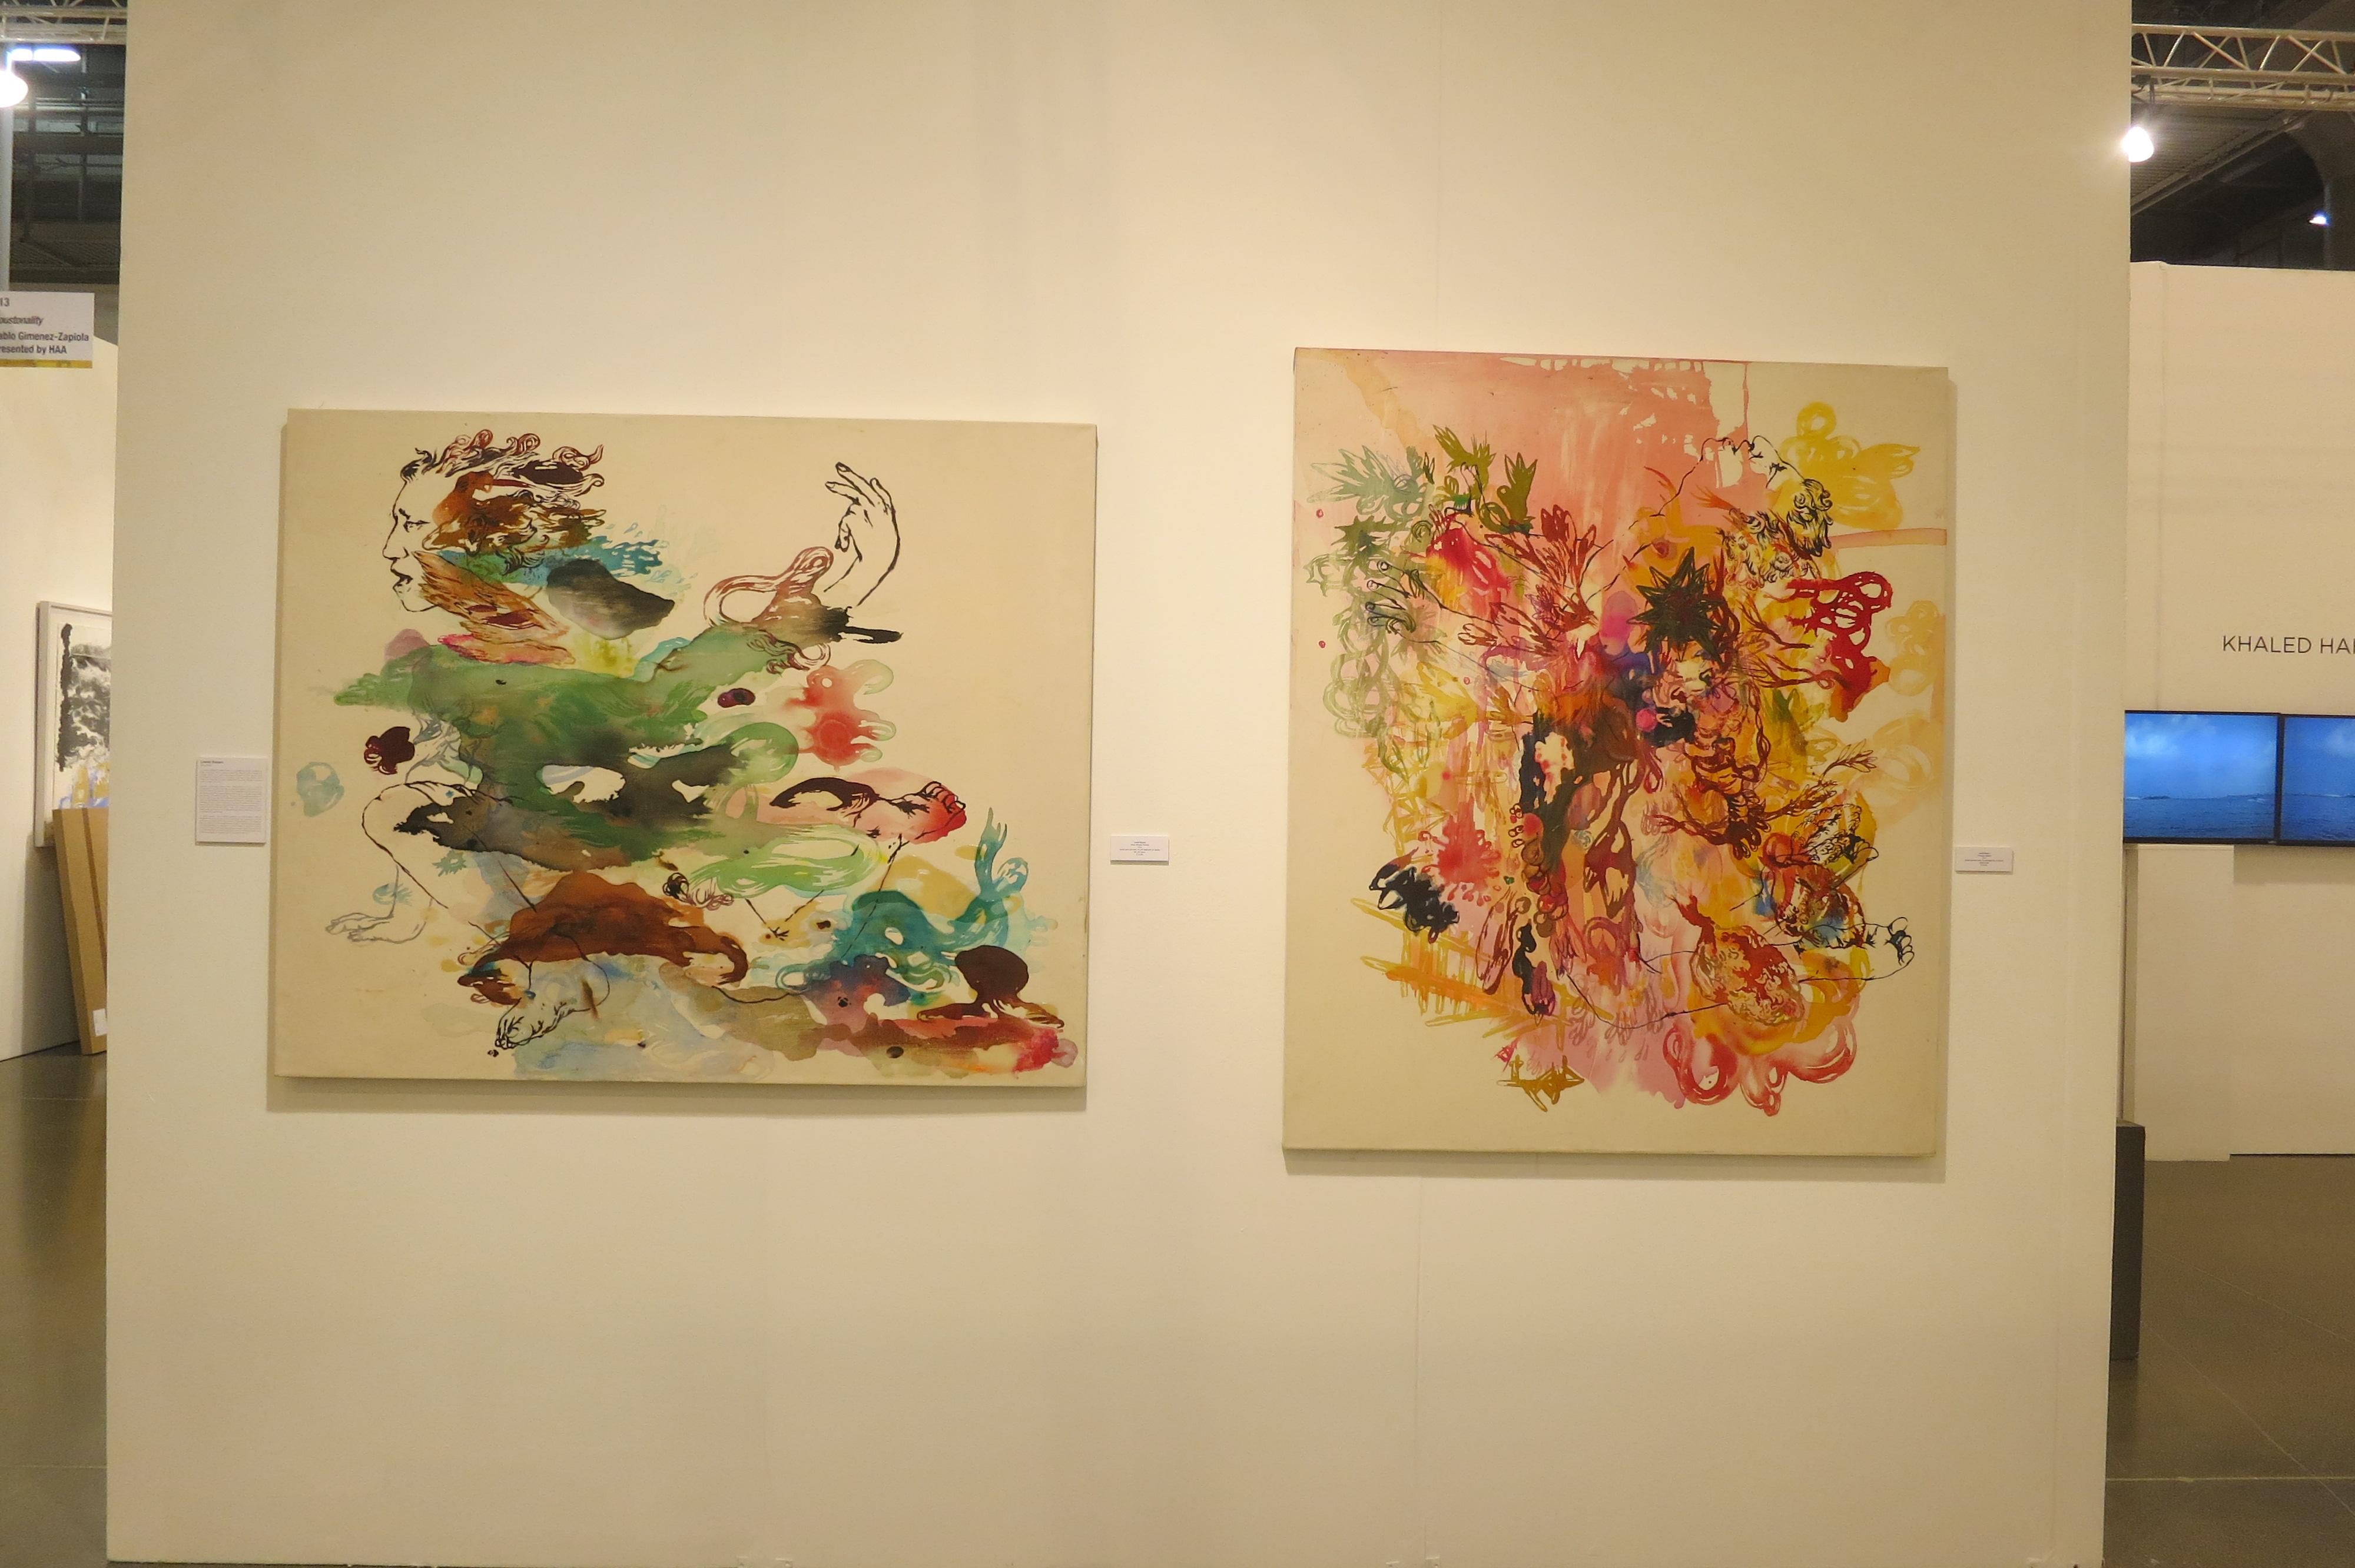 Watercolor art galleries in houston - 2014 Houston Fine Art Fair